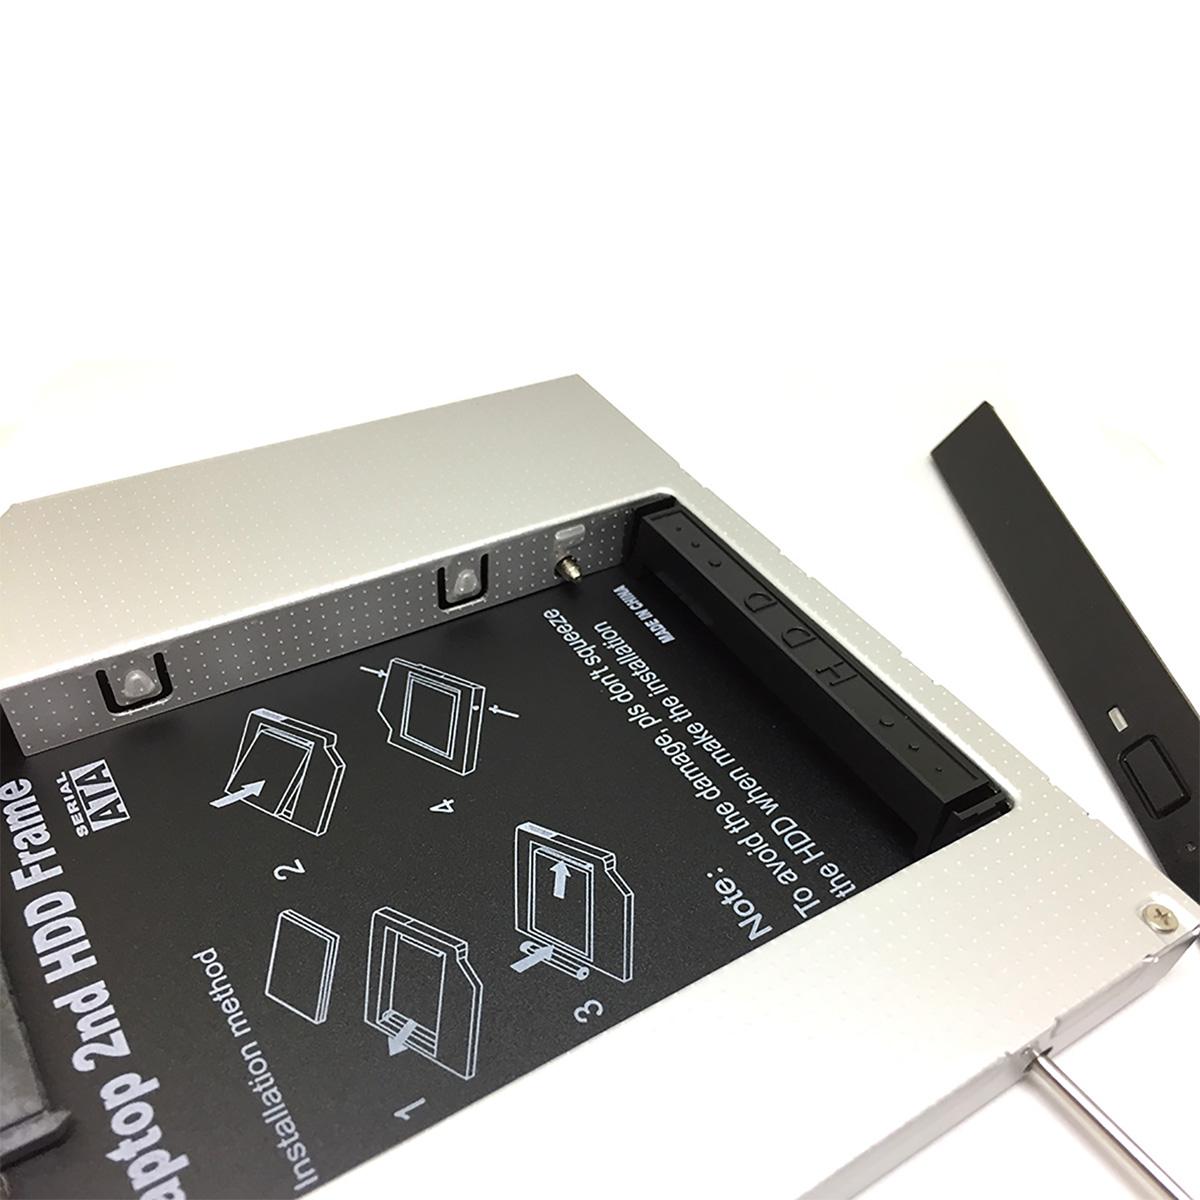 "Адаптер оптибей Espada IS12 mIDE/SATA 12,7мм для подключения HDD/SSD 2,5"" к ноутбуку вместо DVD"